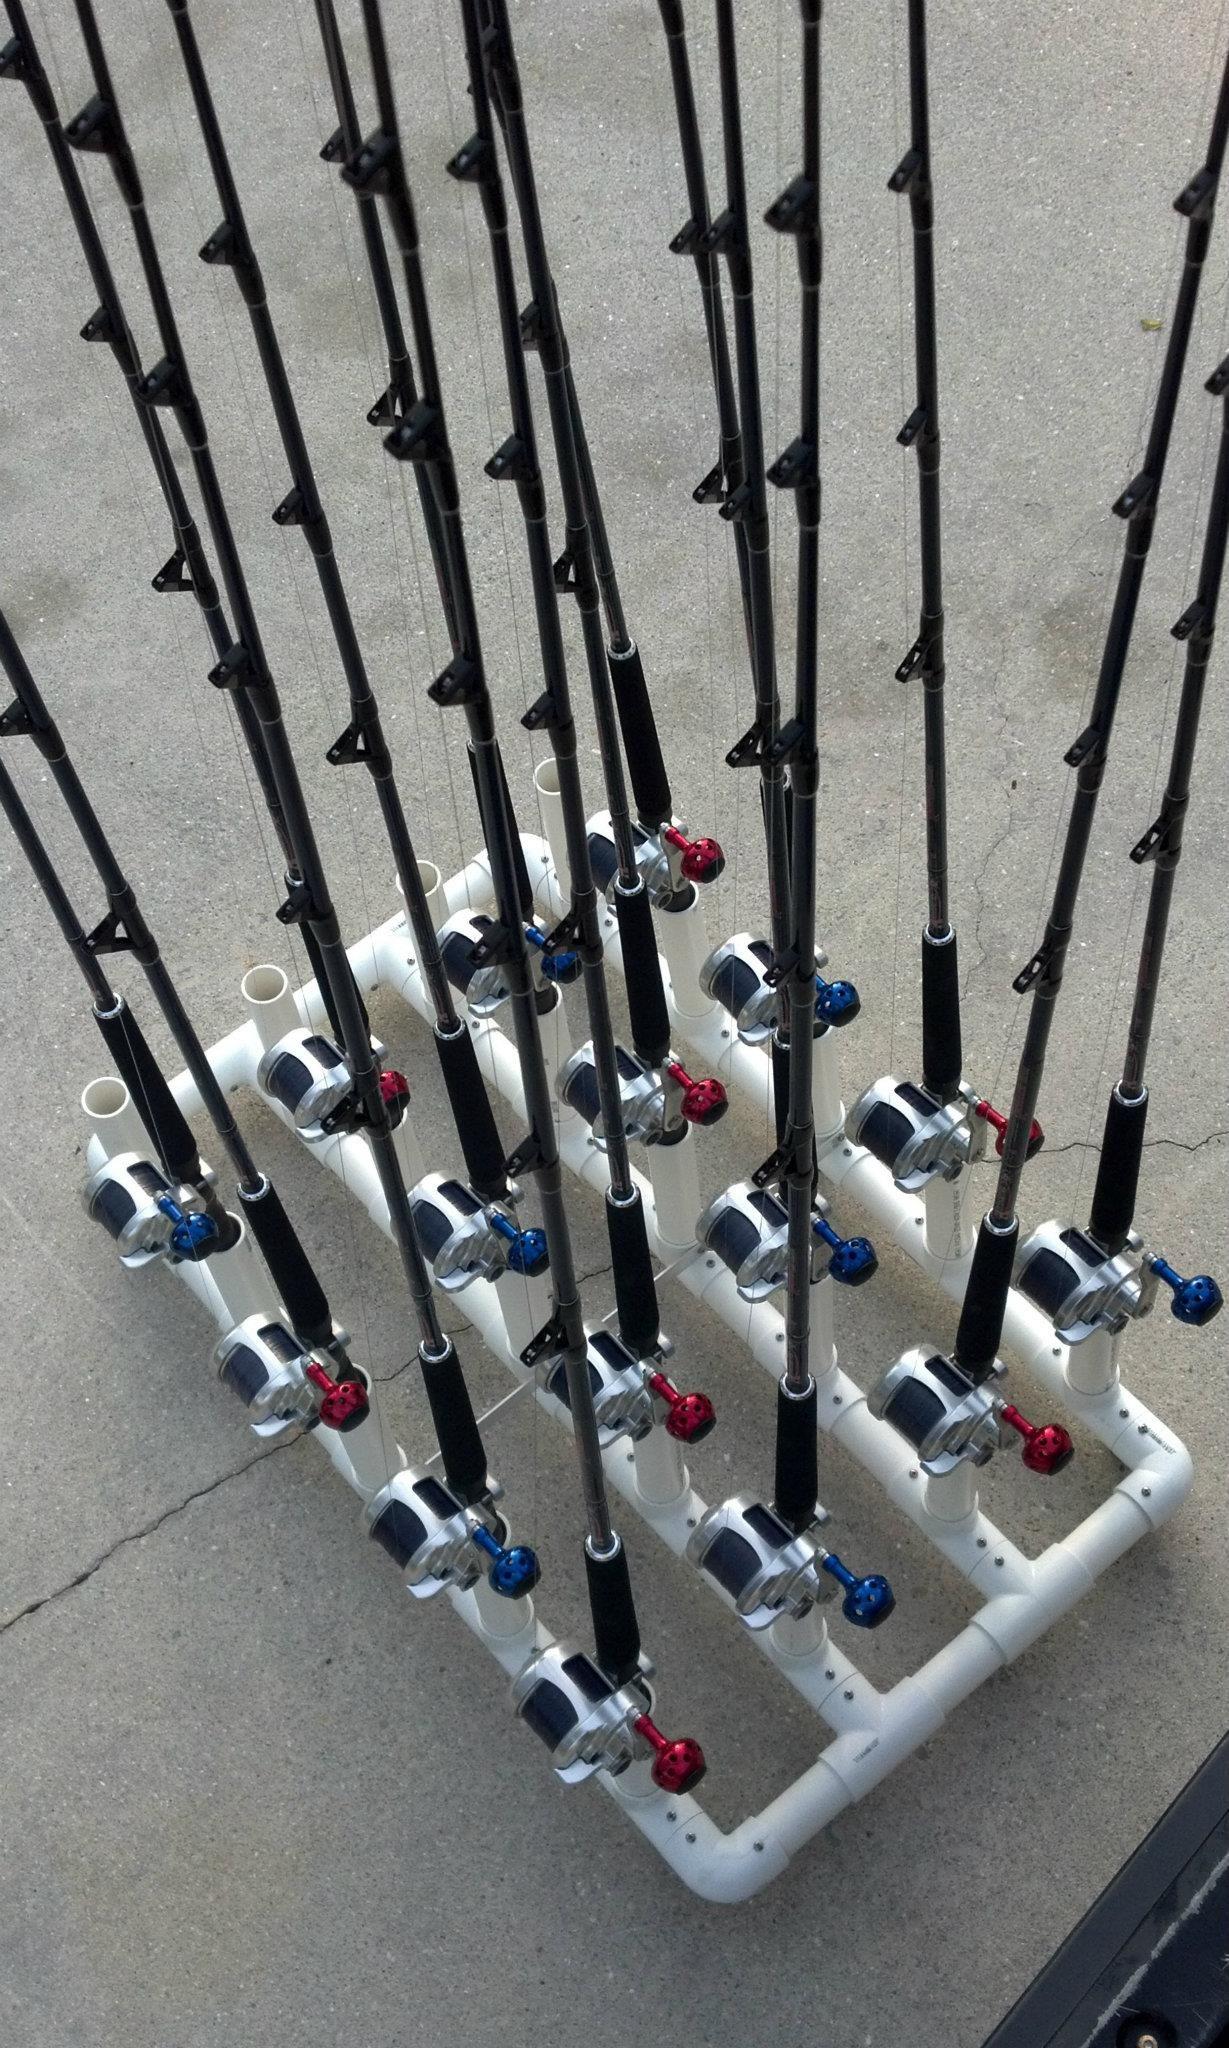 Pvc Fishing Rod Holder Ideas Pvc Fishing Rod Holder Fishing Rod Holder Fishing Rod